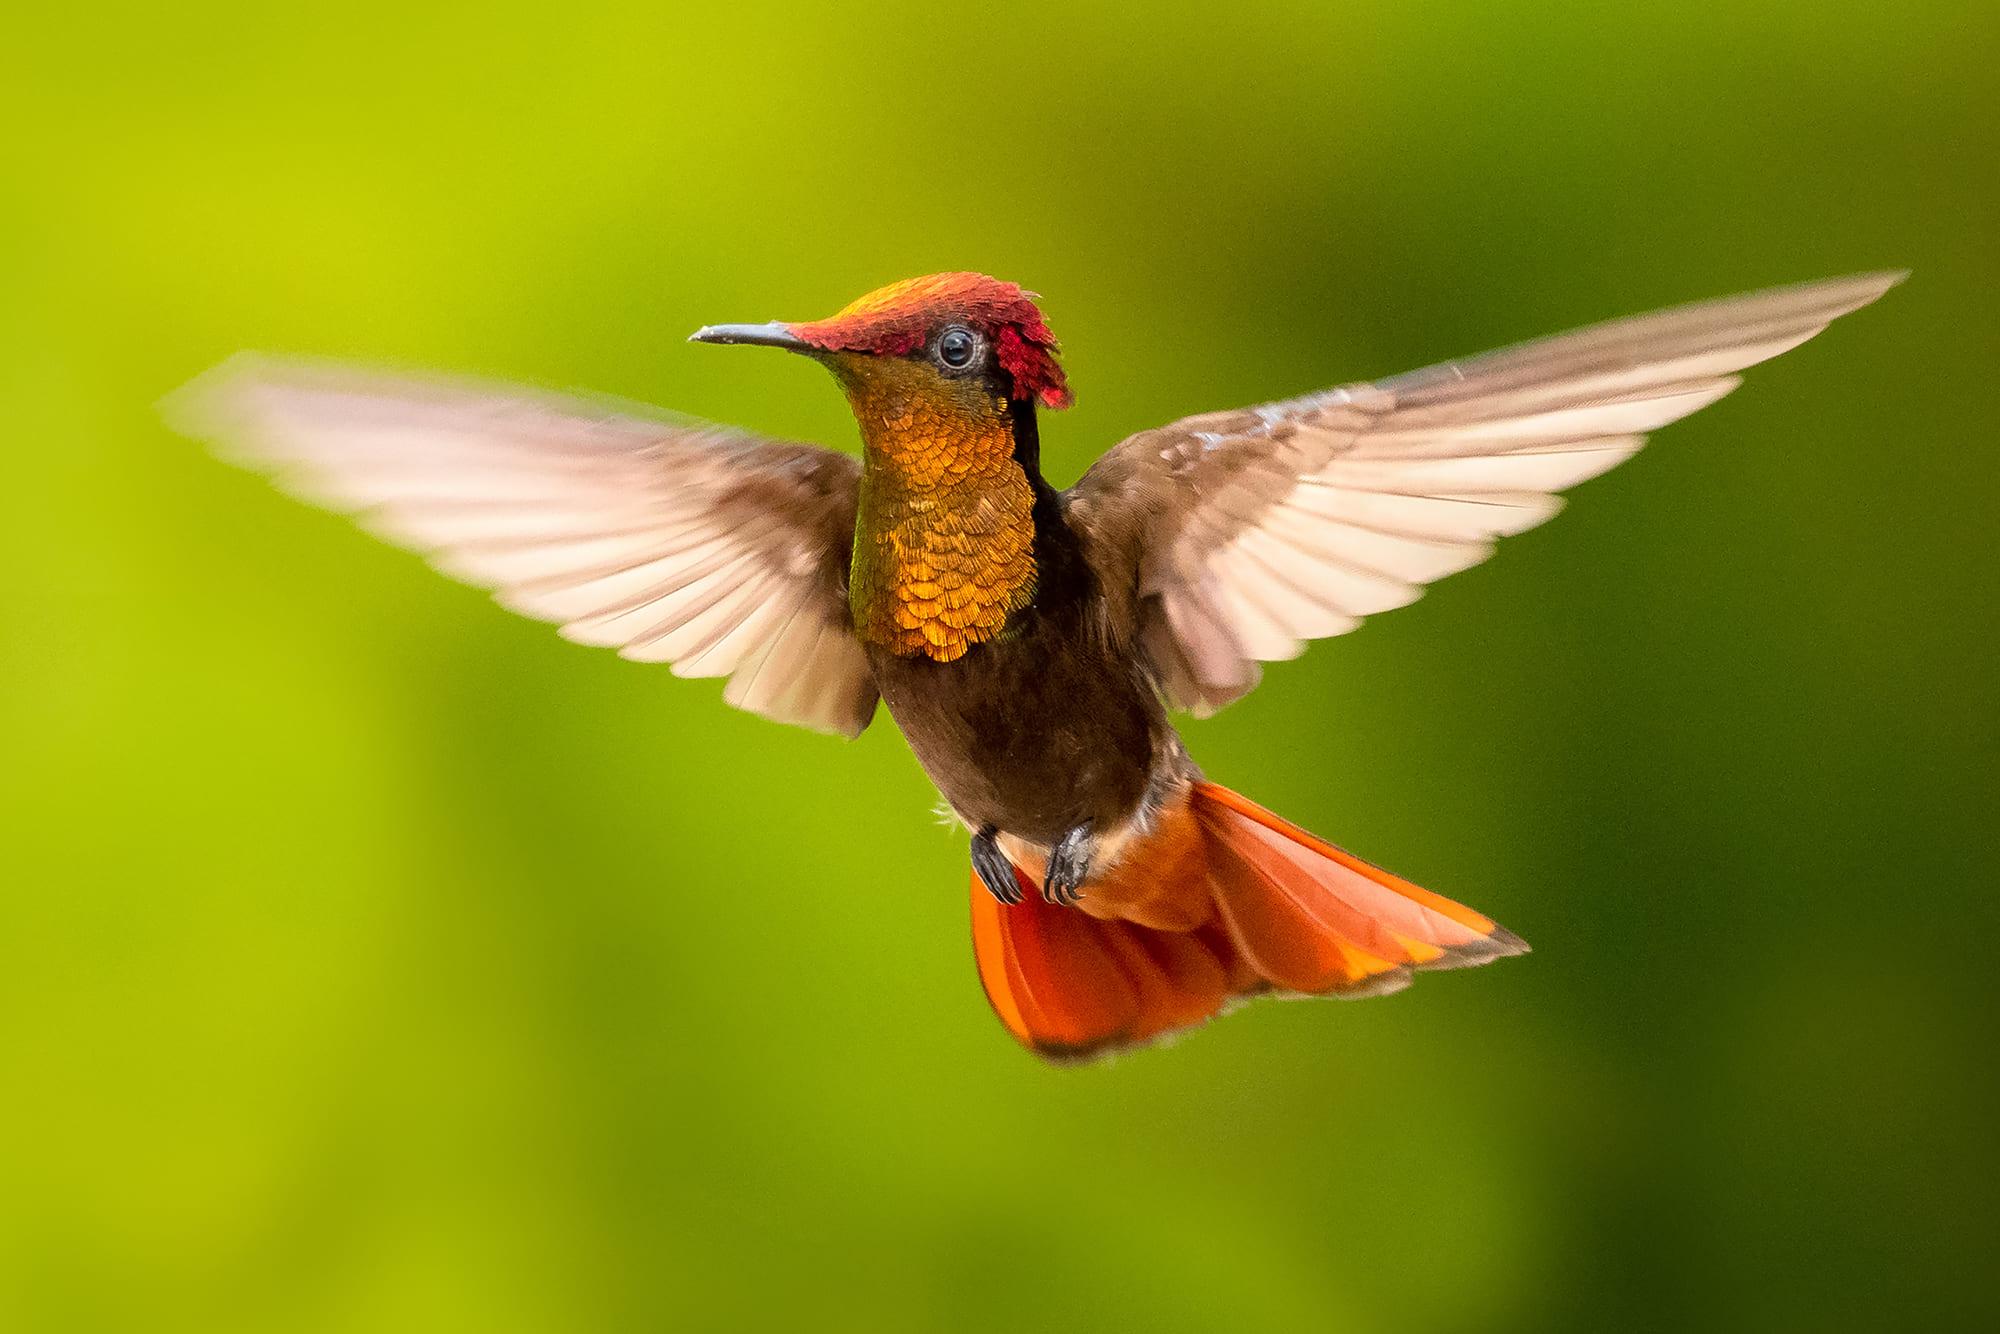 Ruby-topaz Hummingbird on the island of Trinidad.